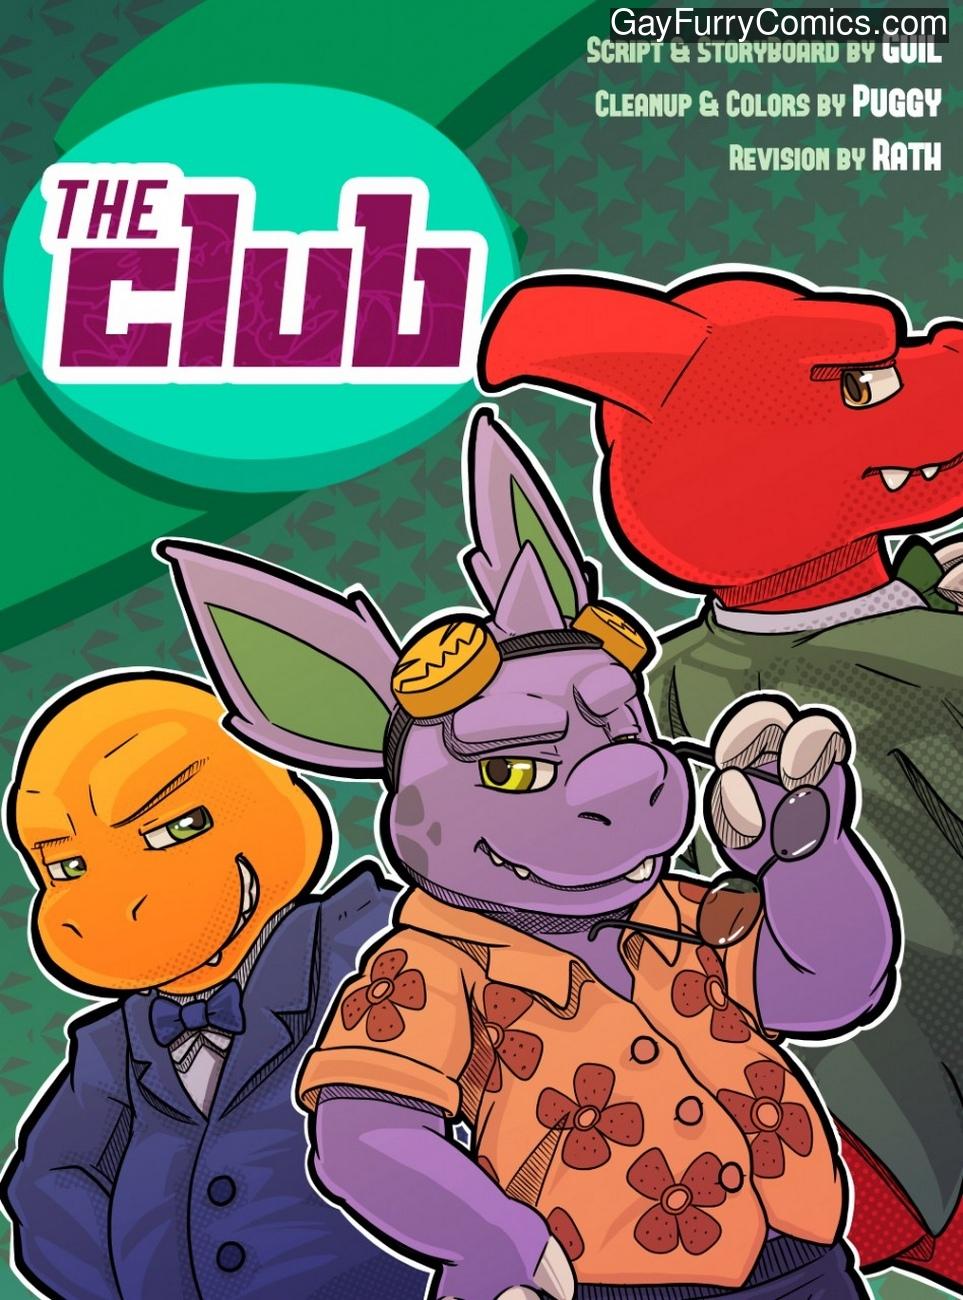 The Club 1 gay furry comic